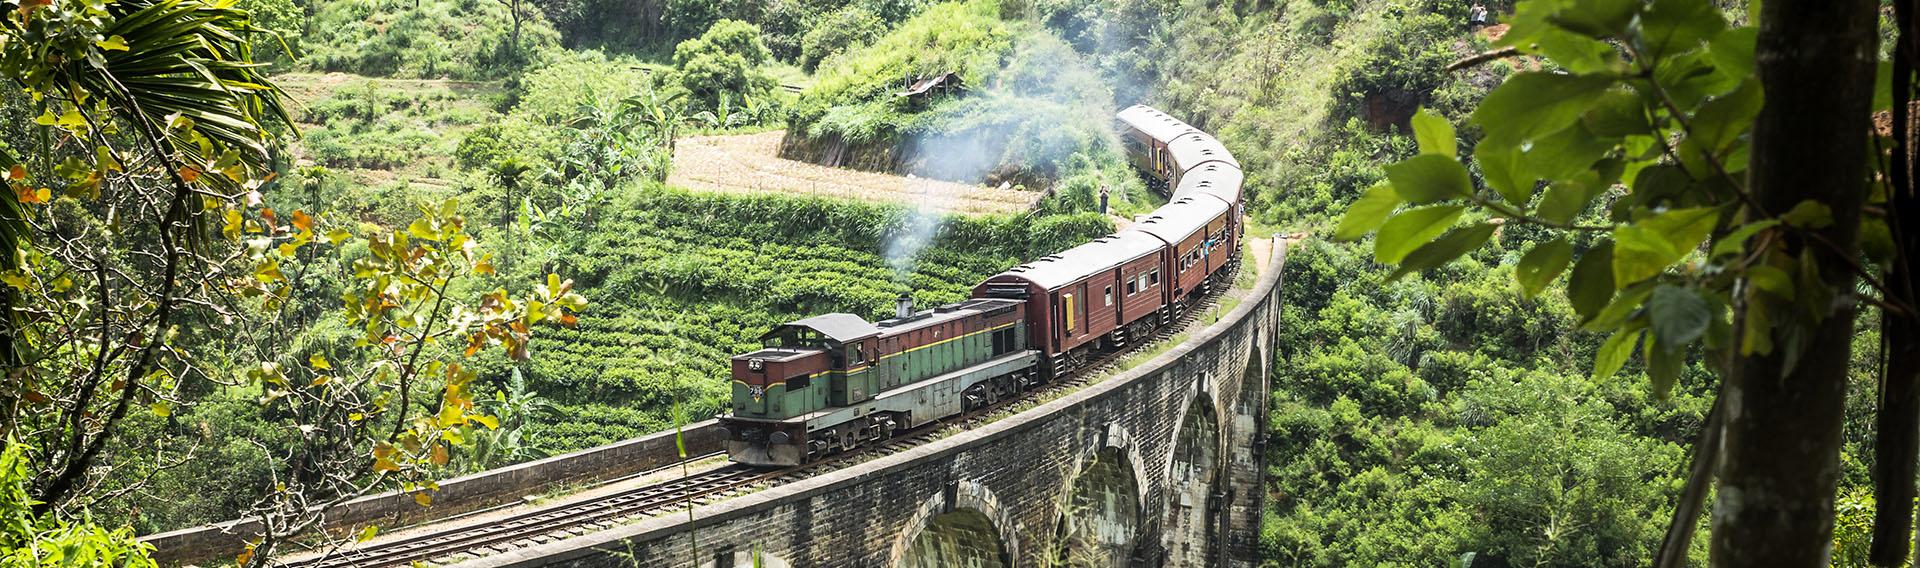 Sri Lanka, Ella, Pont des neuf arches